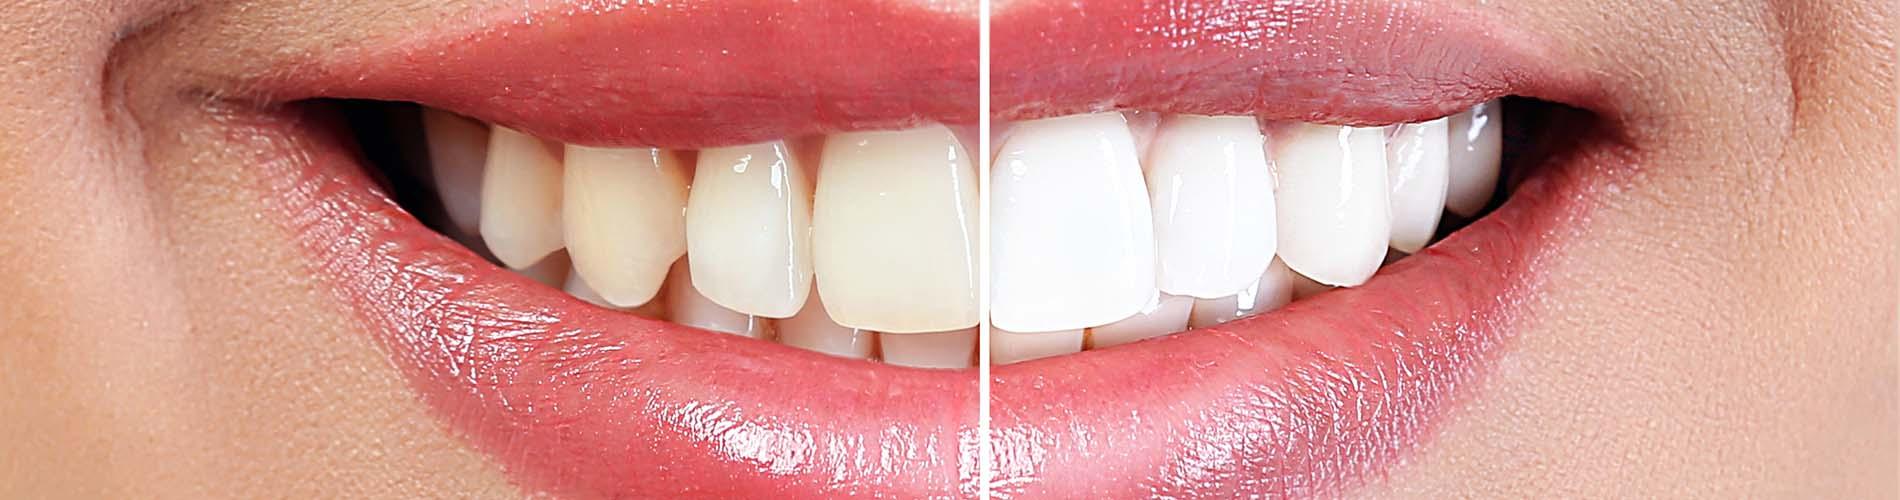 Teeth whitening Ripponden | Teeth whitening Ashton